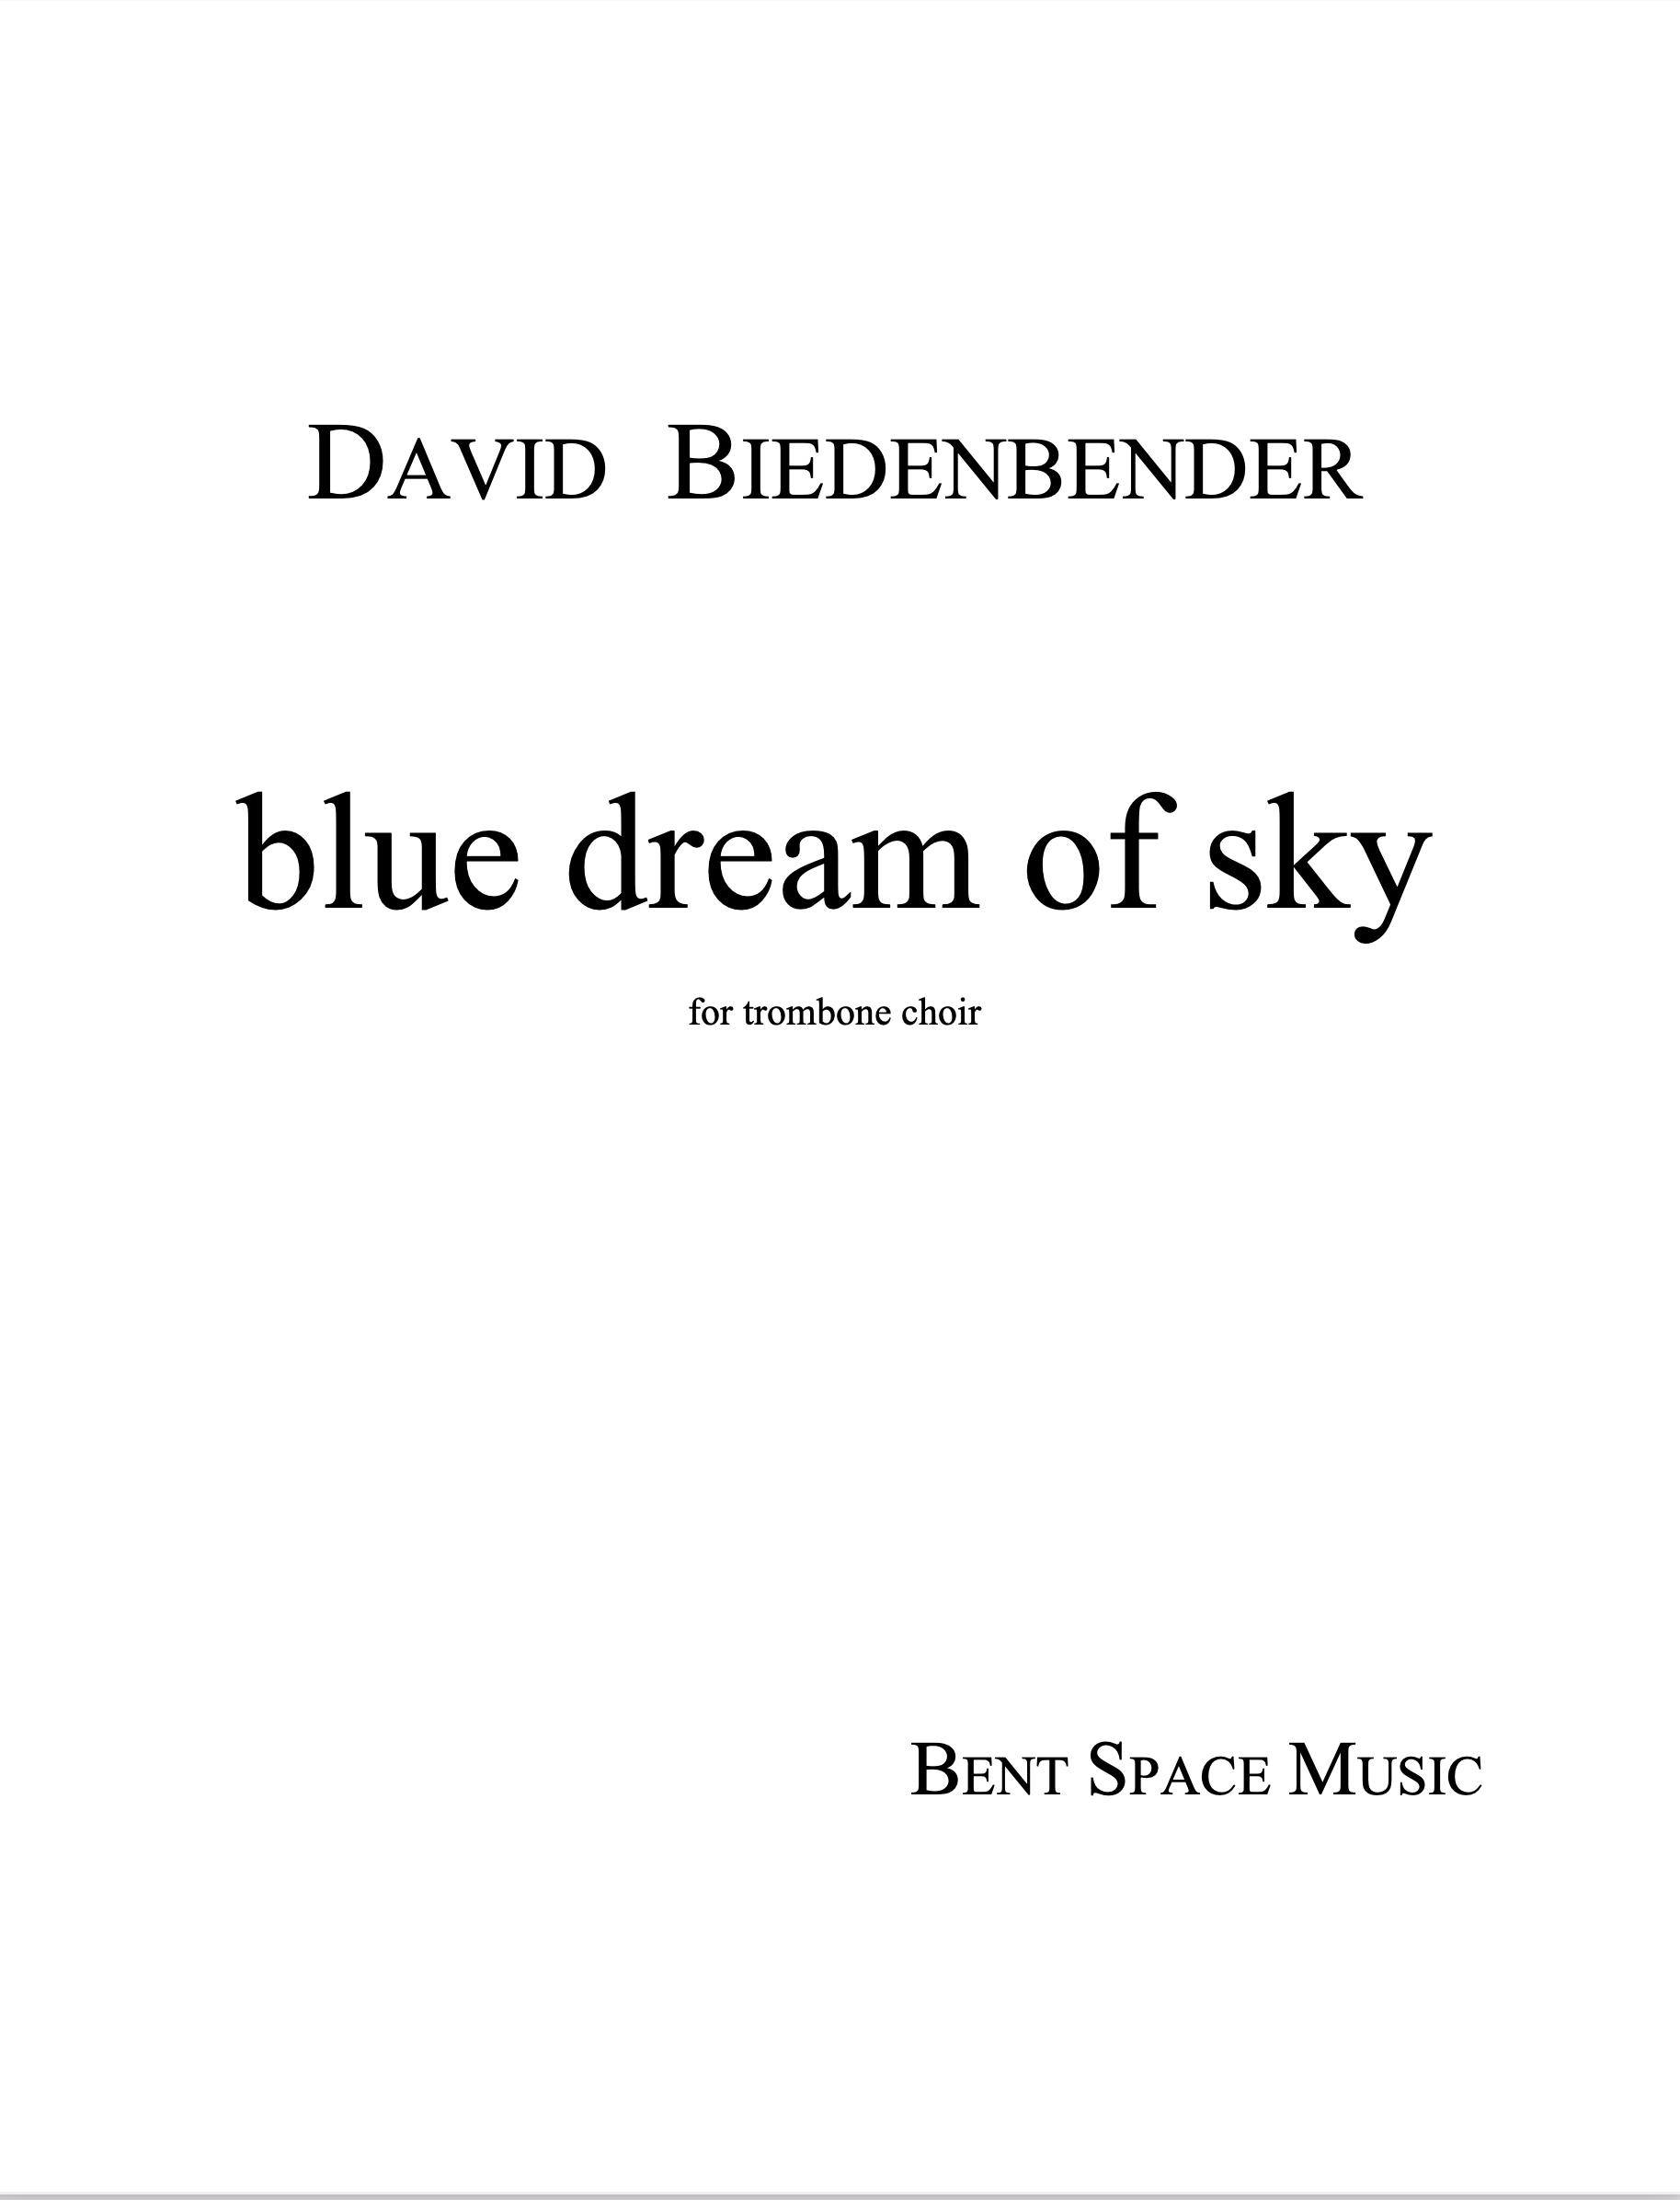 Blue Dream Of Sky by David Biedenbender